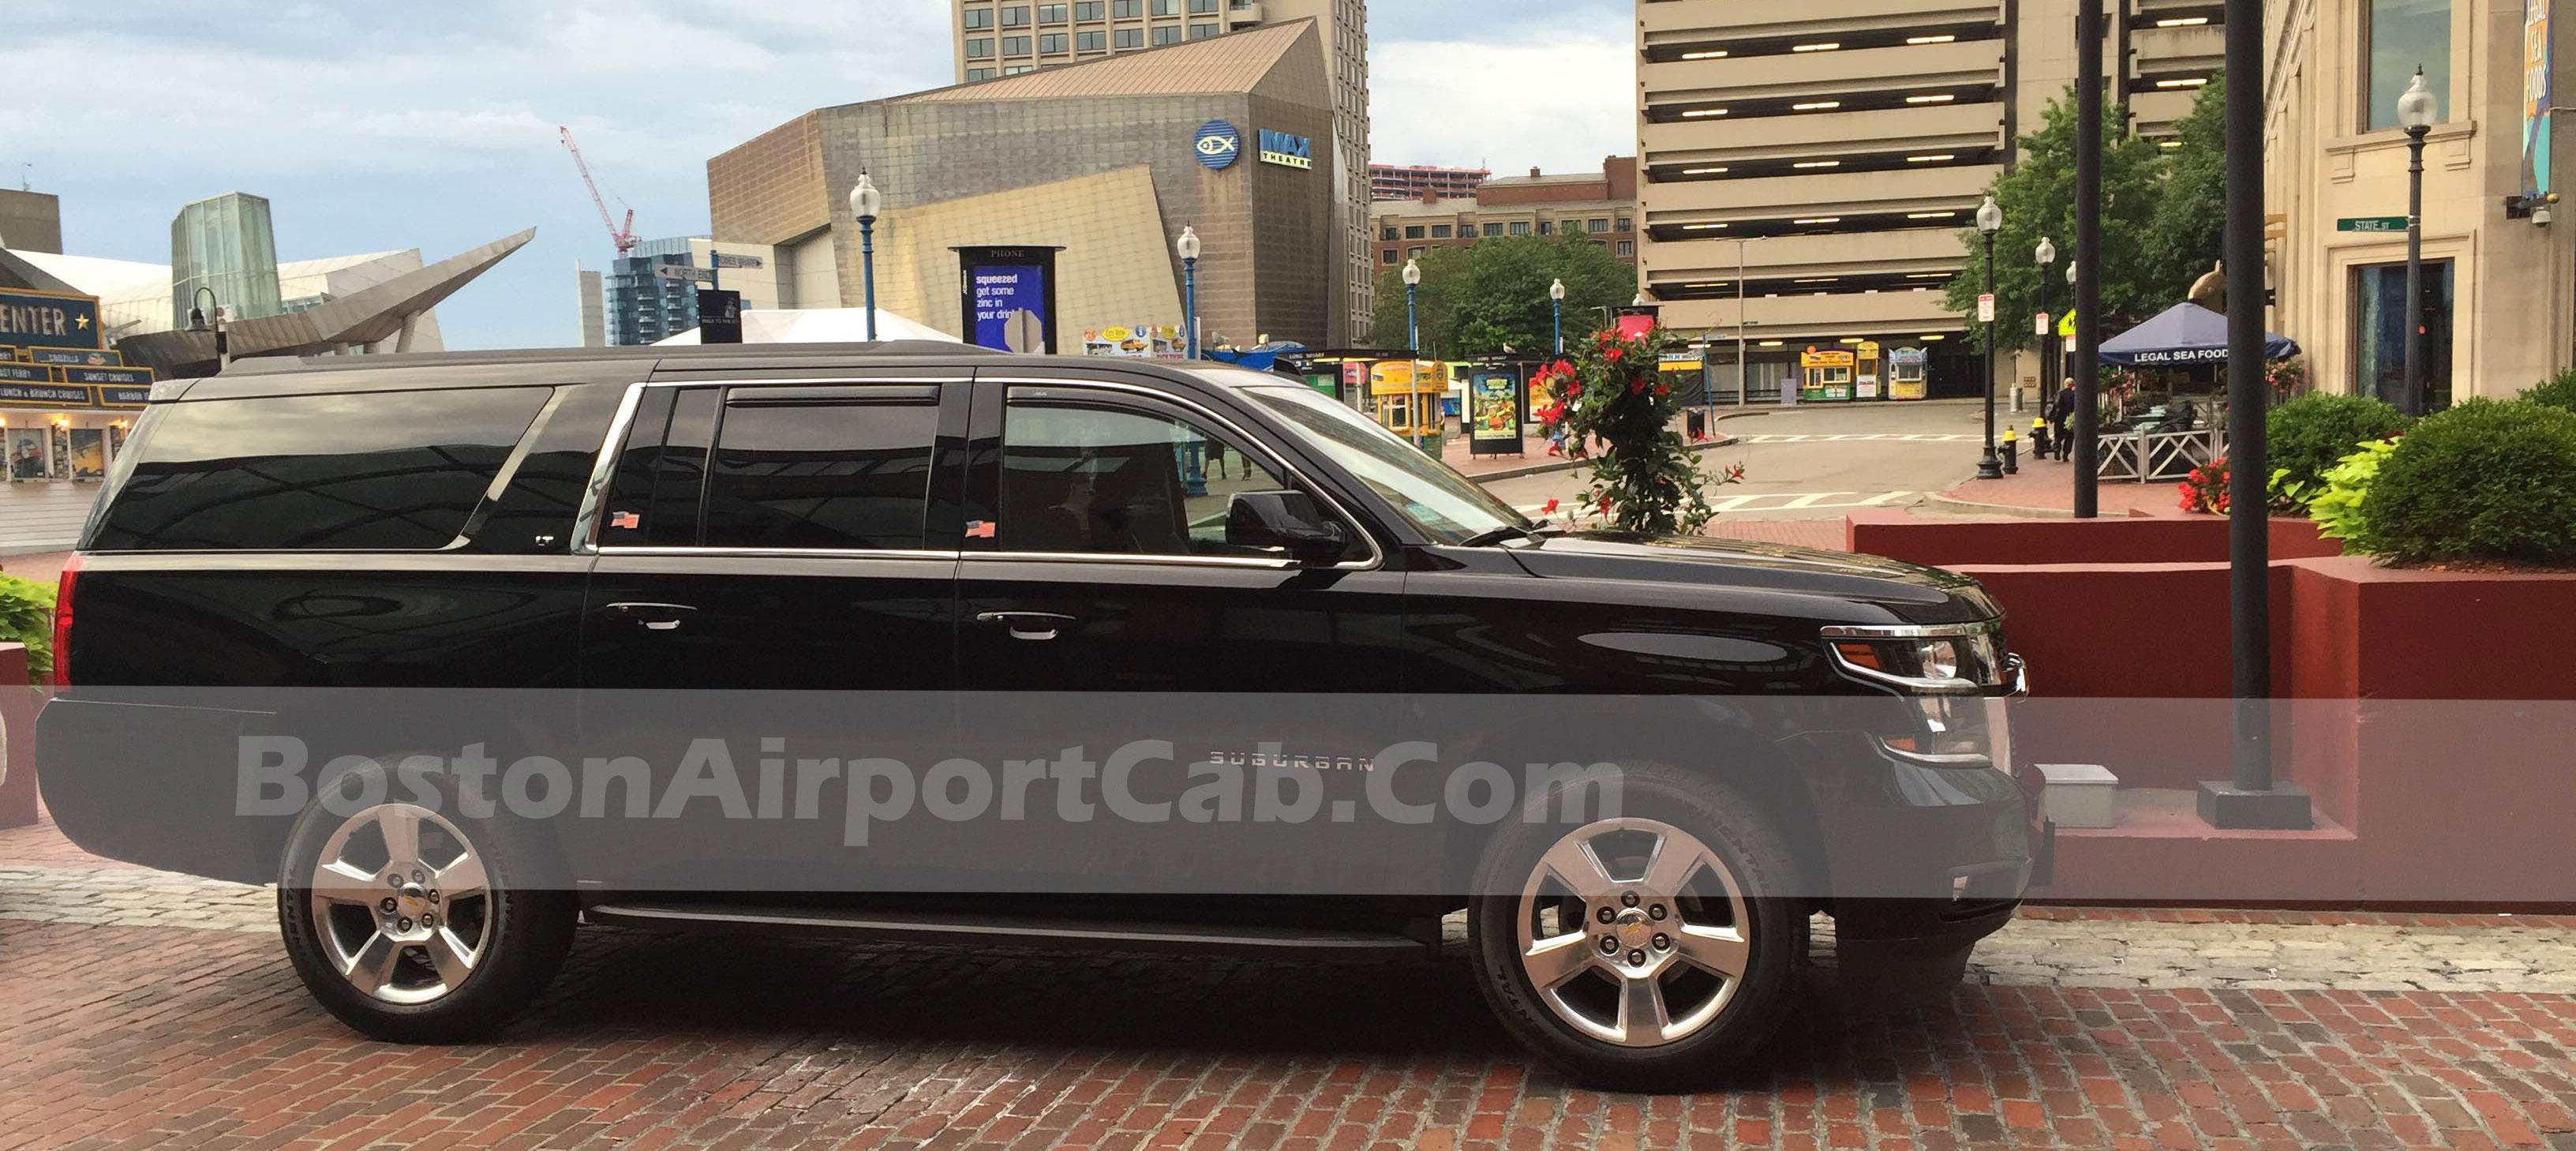 Boston Car Service Town Logan Airport Lincoln Taxi Services